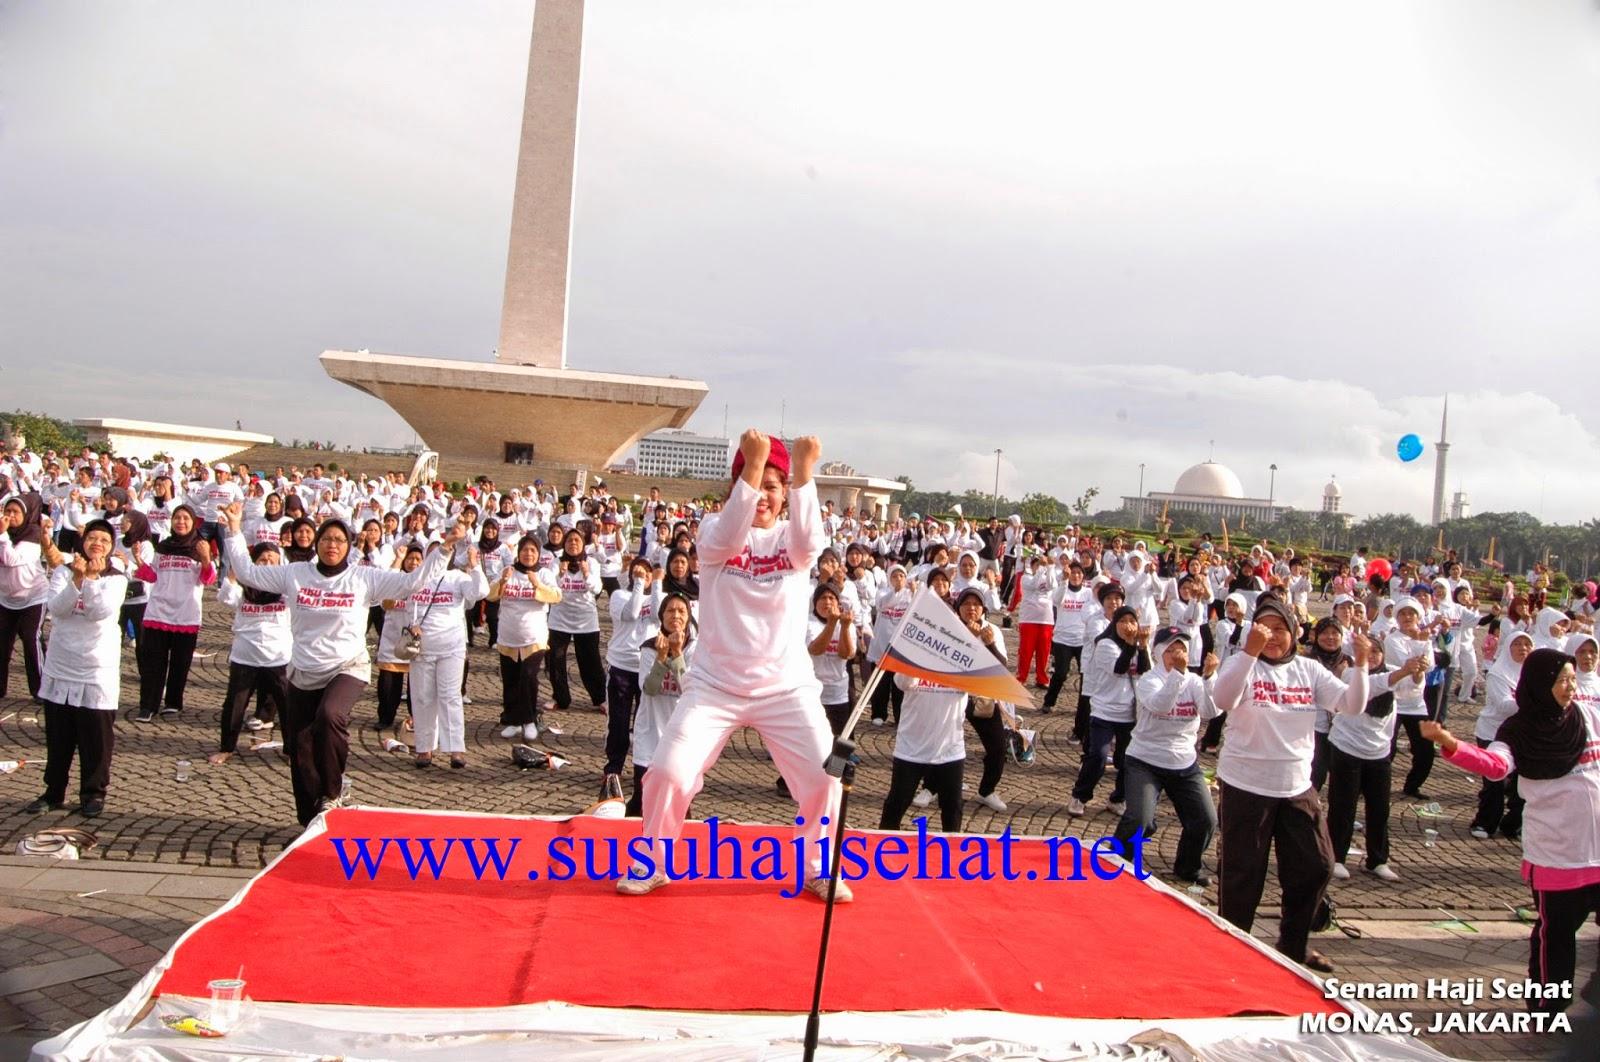 Senam Susu Haji Sehat  Monas Jakarta